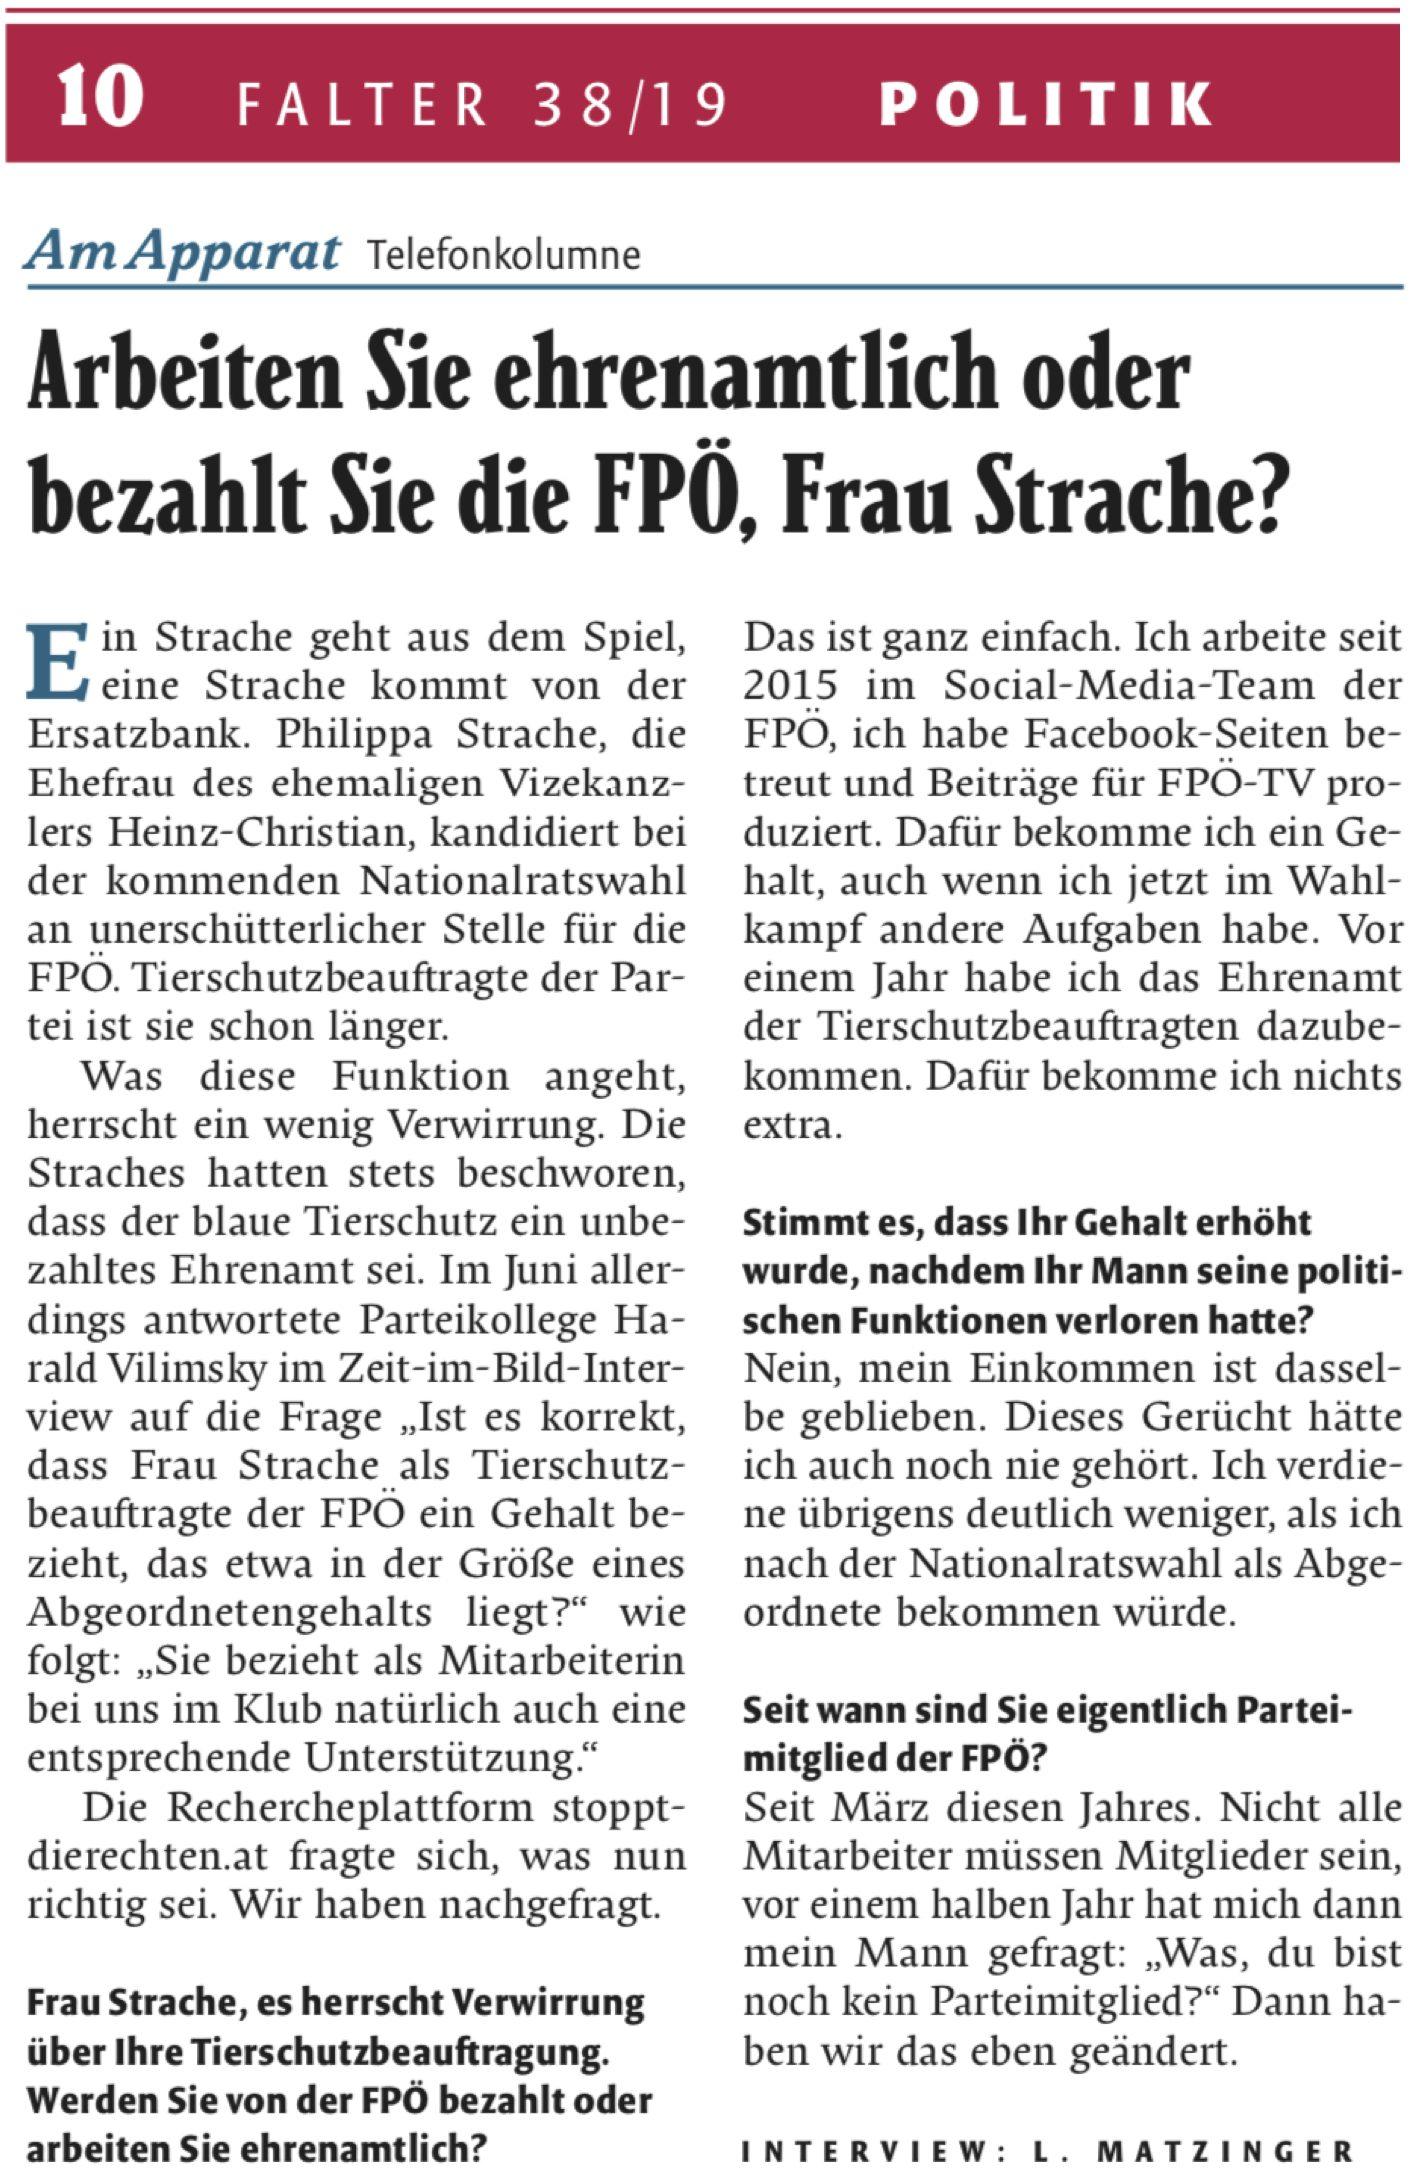 Falter-Telefonat mit Philippa Strache (Falter Nr. 38/19, Seite 10)